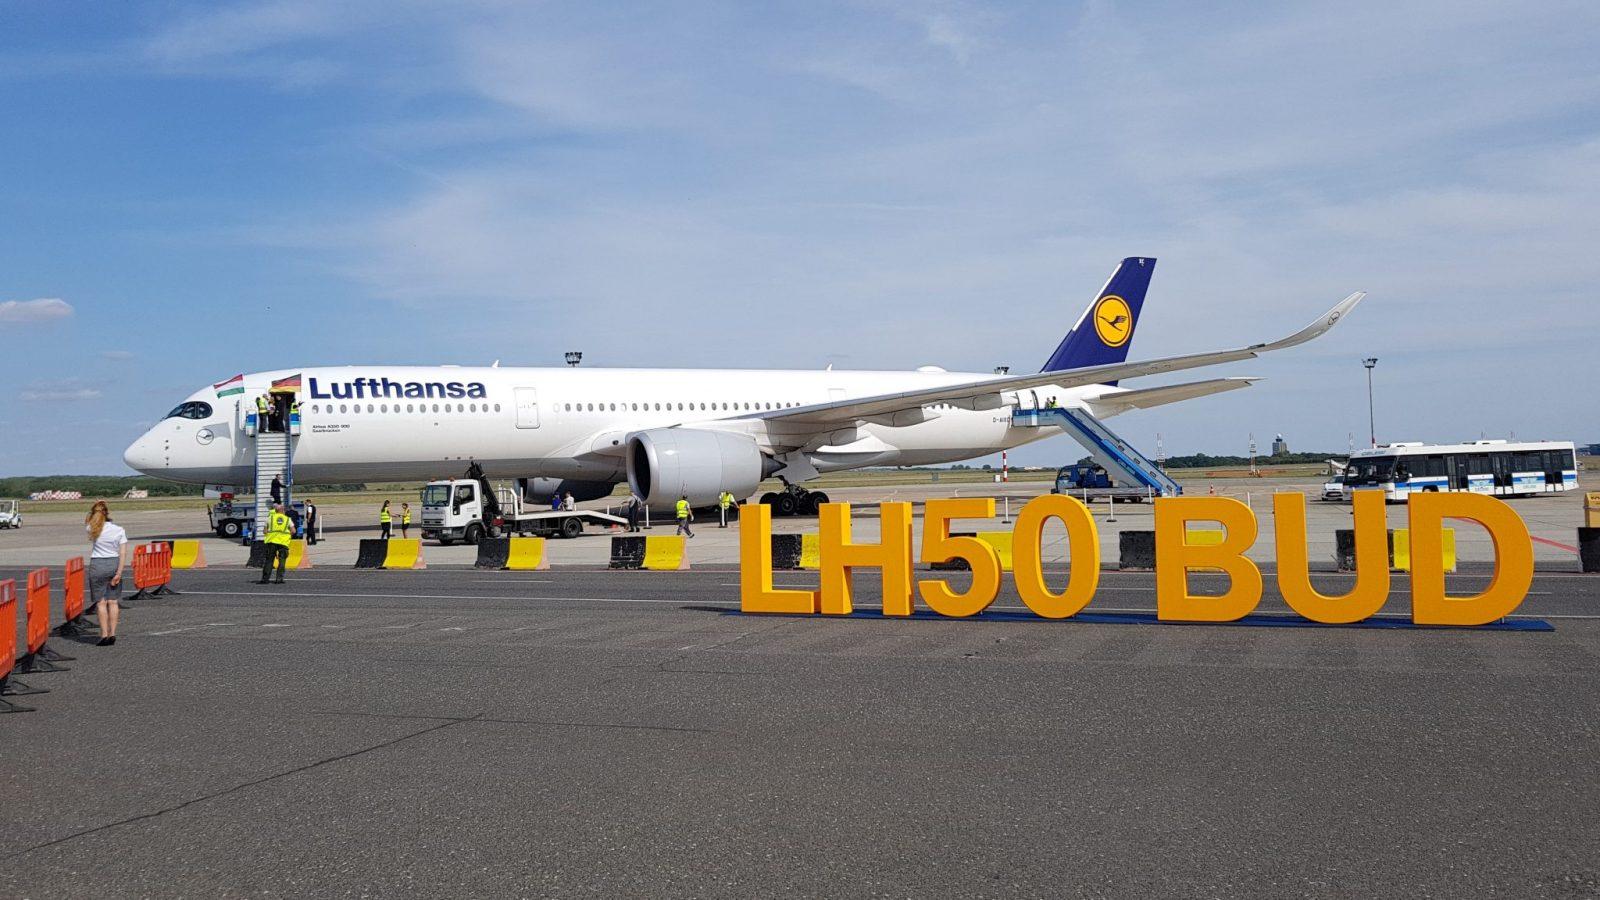 [VIDEO REPORTAŽA] 50 godina leta Lufthanse sa Budimpeštu i 50 sekundi zabave u A350-900